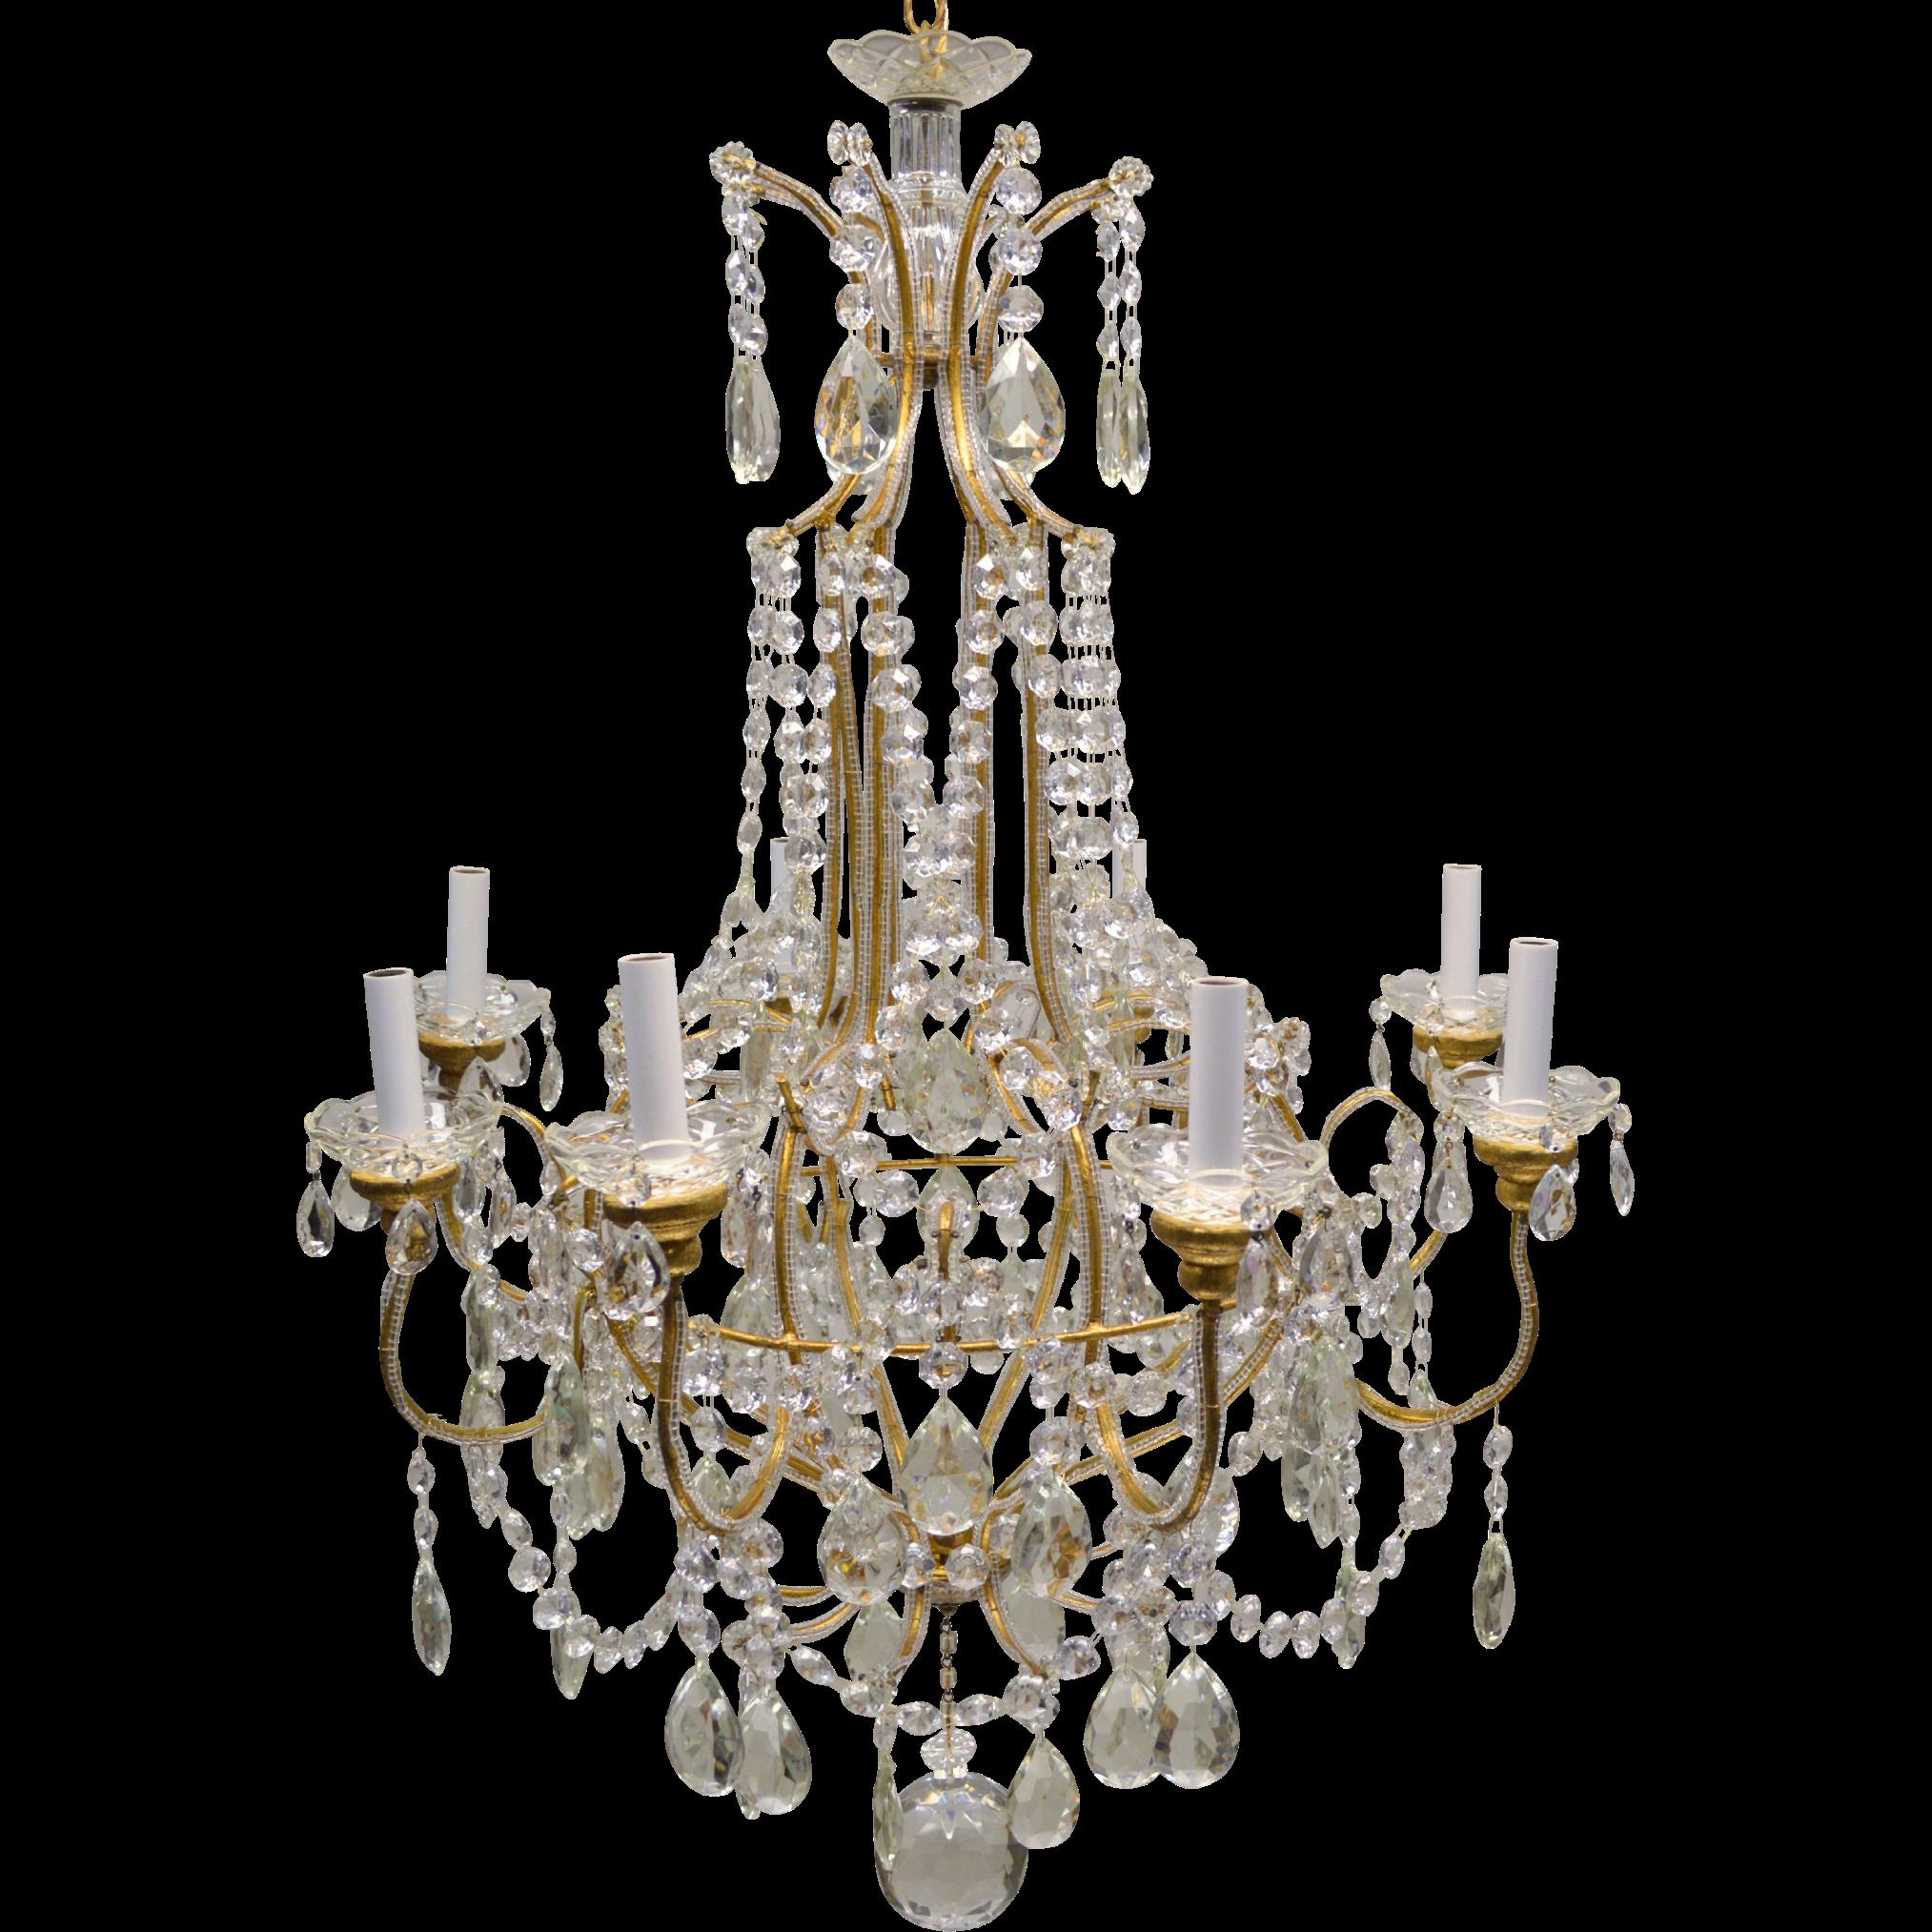 Vintage Beaded Italian Crystal Chandelier 8 Light